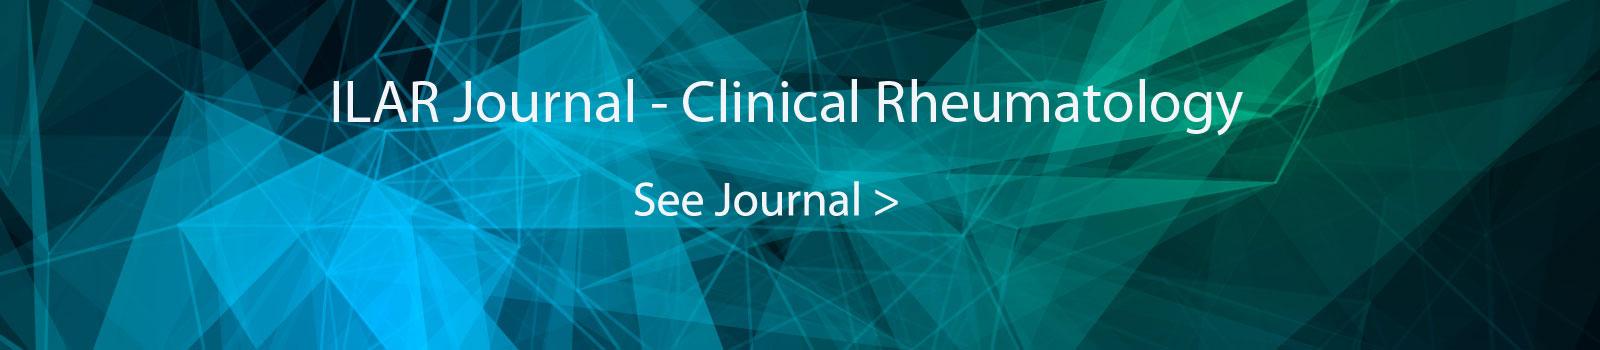 ILAR journal Clinical Rheumatology